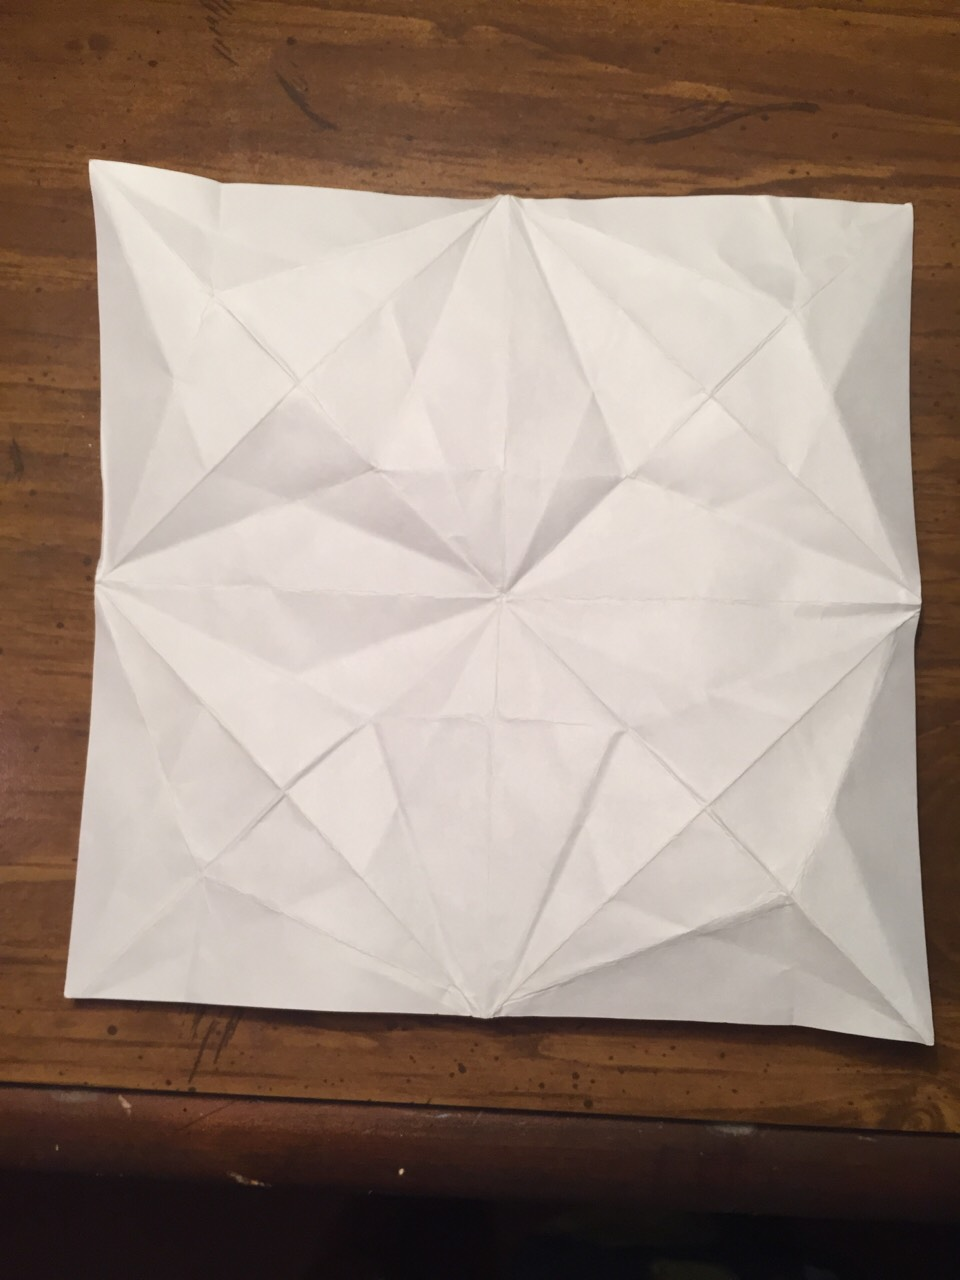 Origami Crane - How to Fold a Traditional Paper Crane | 1280x960